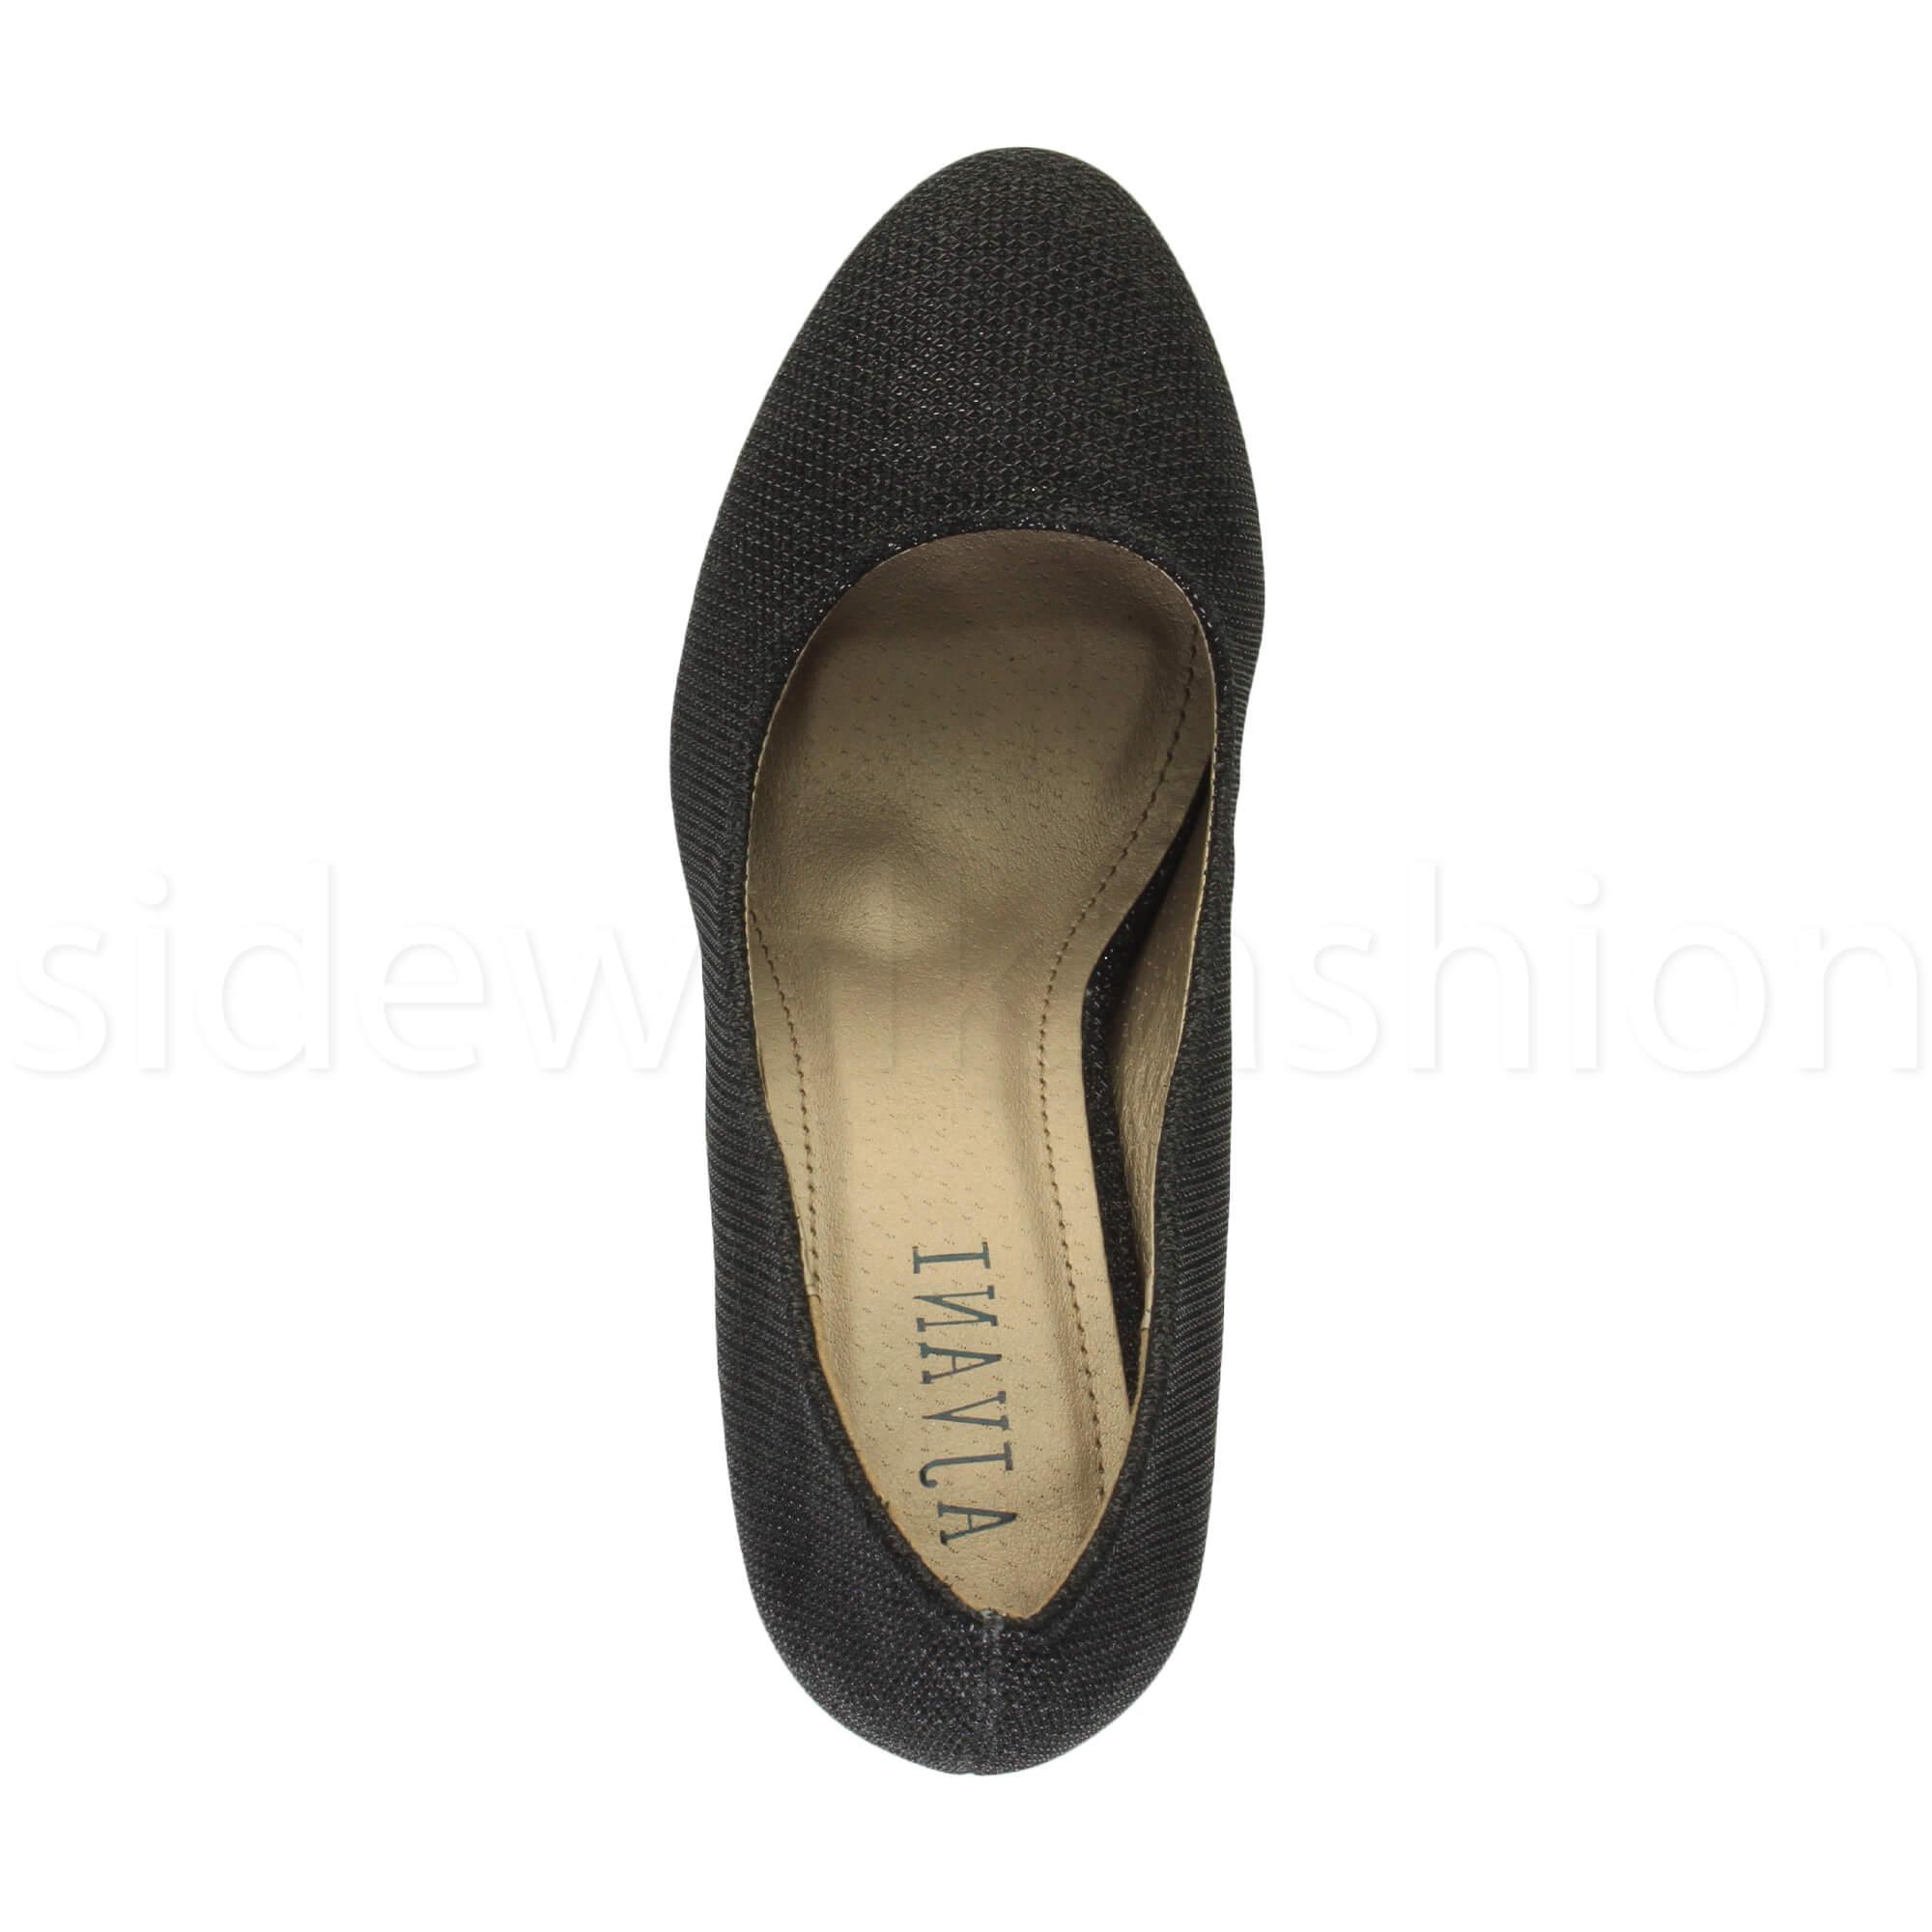 Womens-ladies-high-mid-heel-platform-wedding-evening-bridesmaid-court-shoes-size thumbnail 14